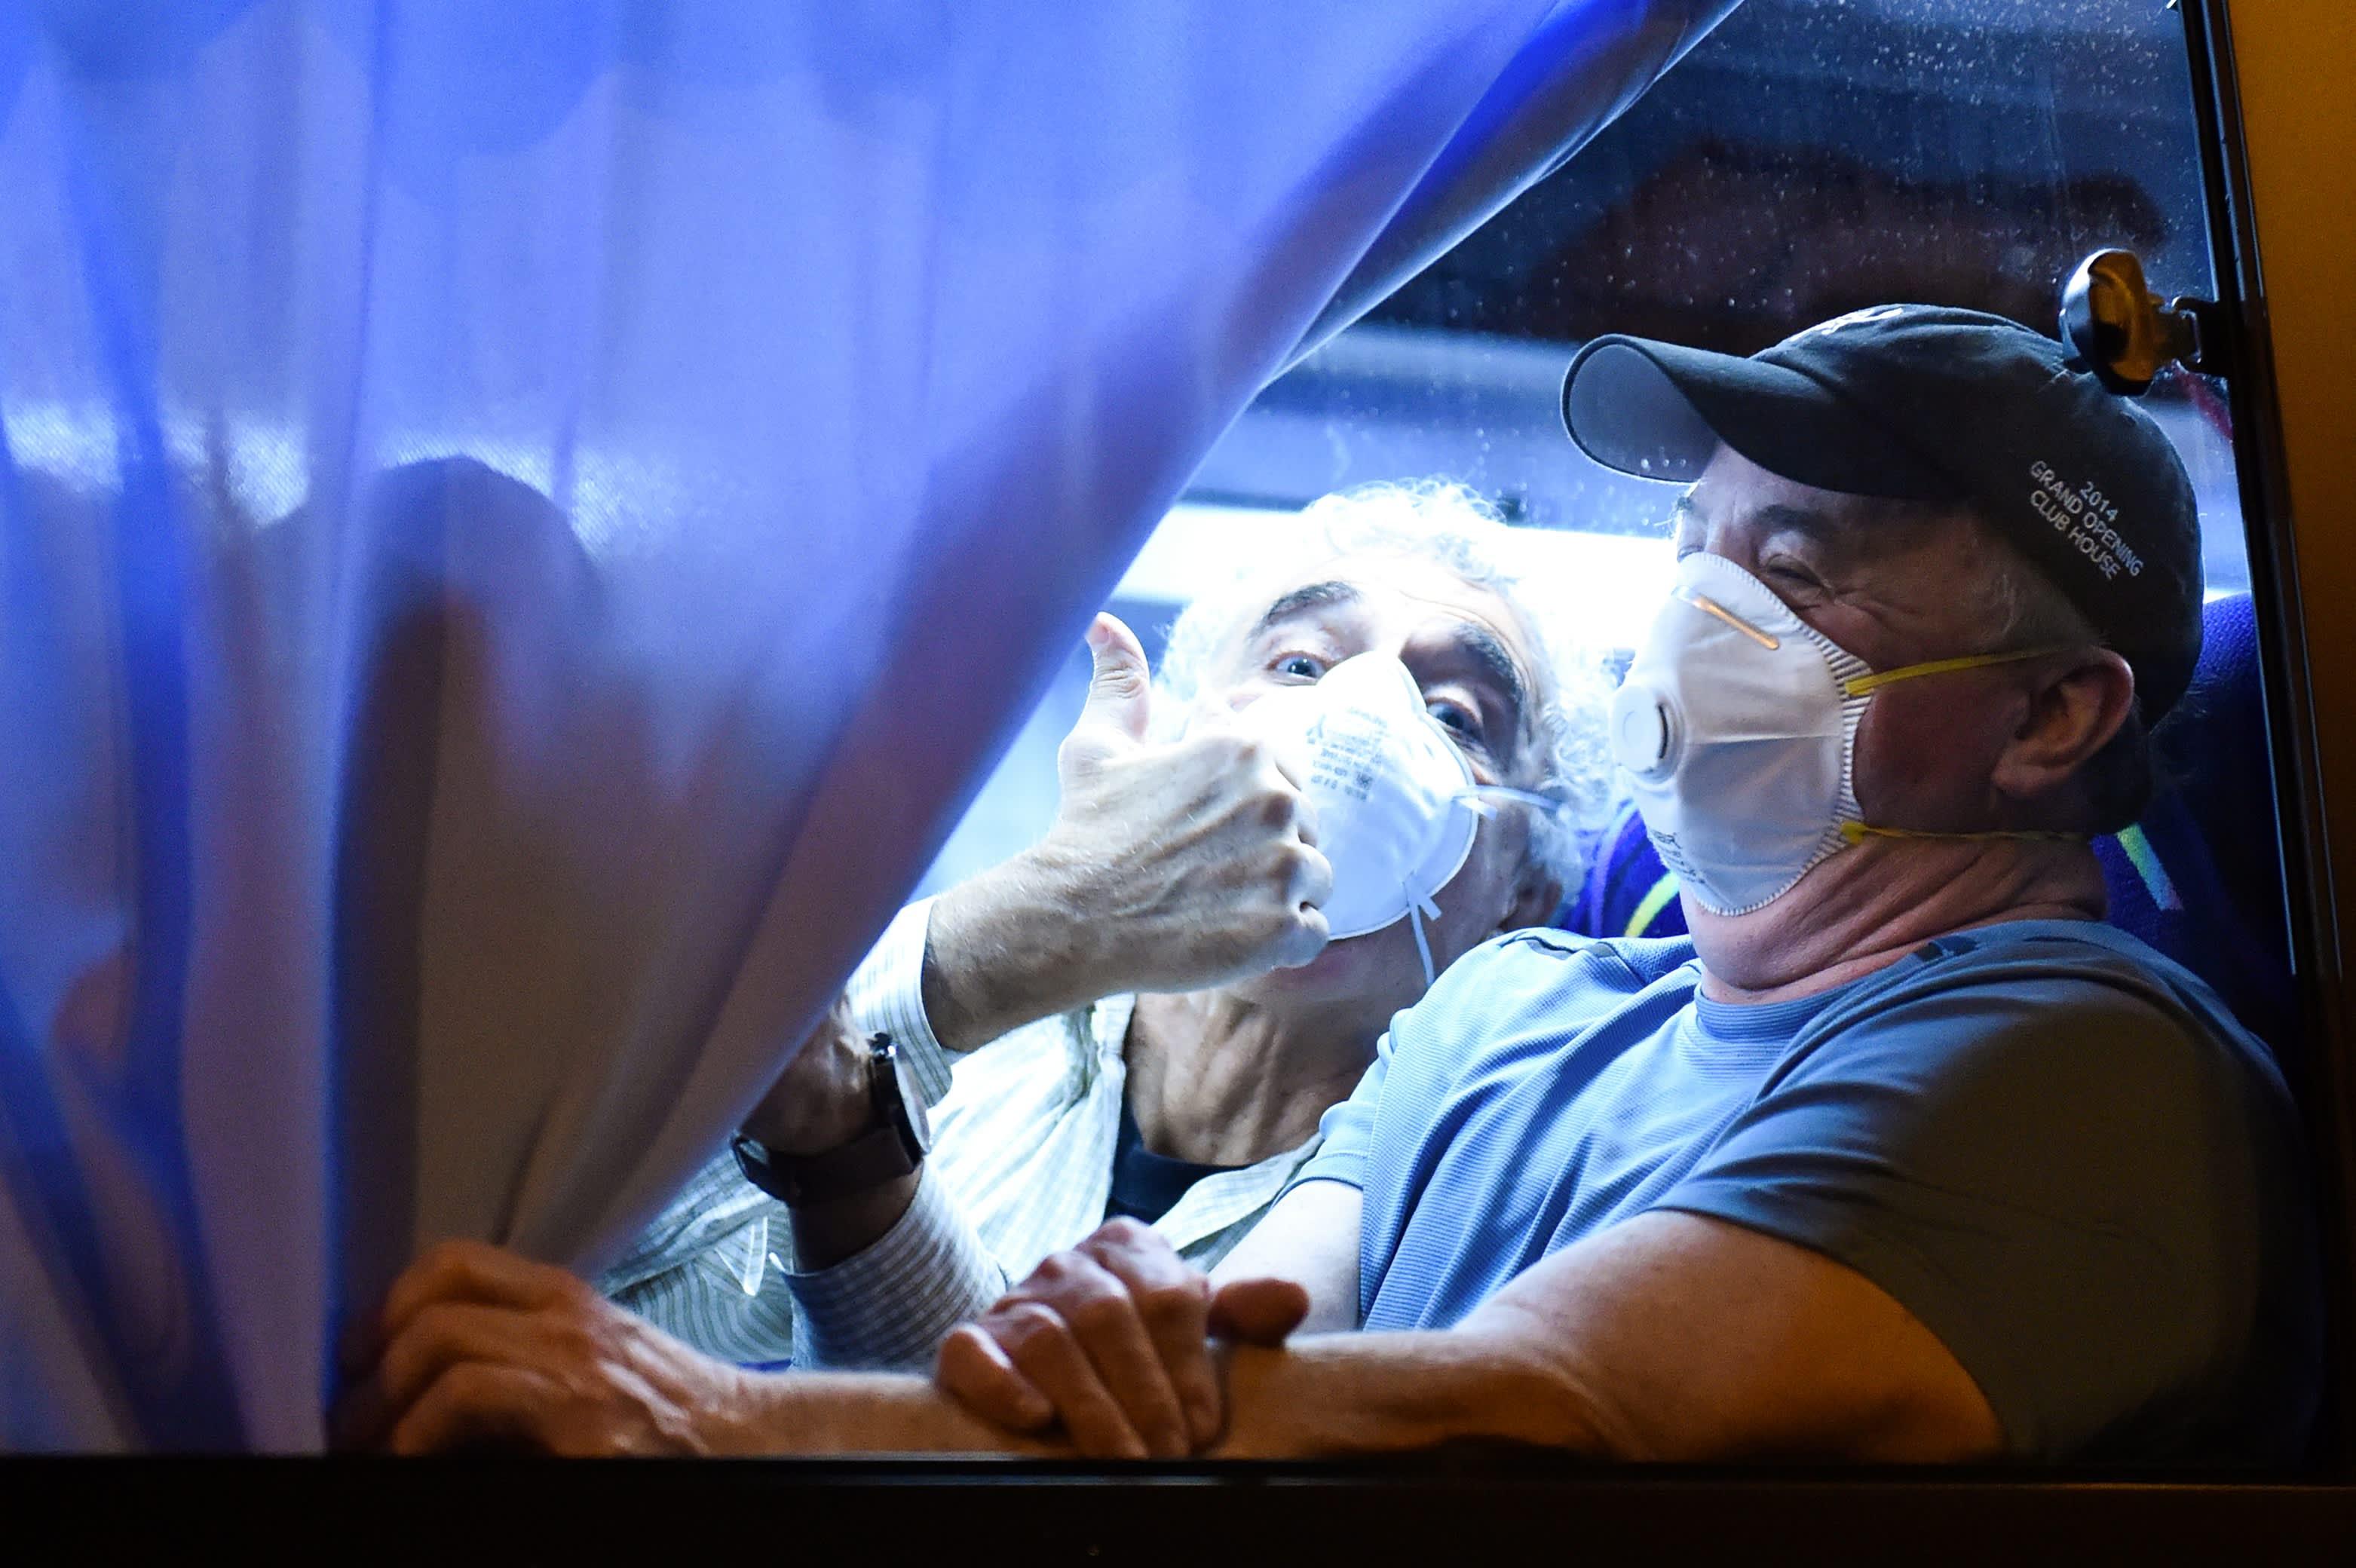 Coronavirus live updates: Americans begin evacuating quarantined cruise ship in Japan